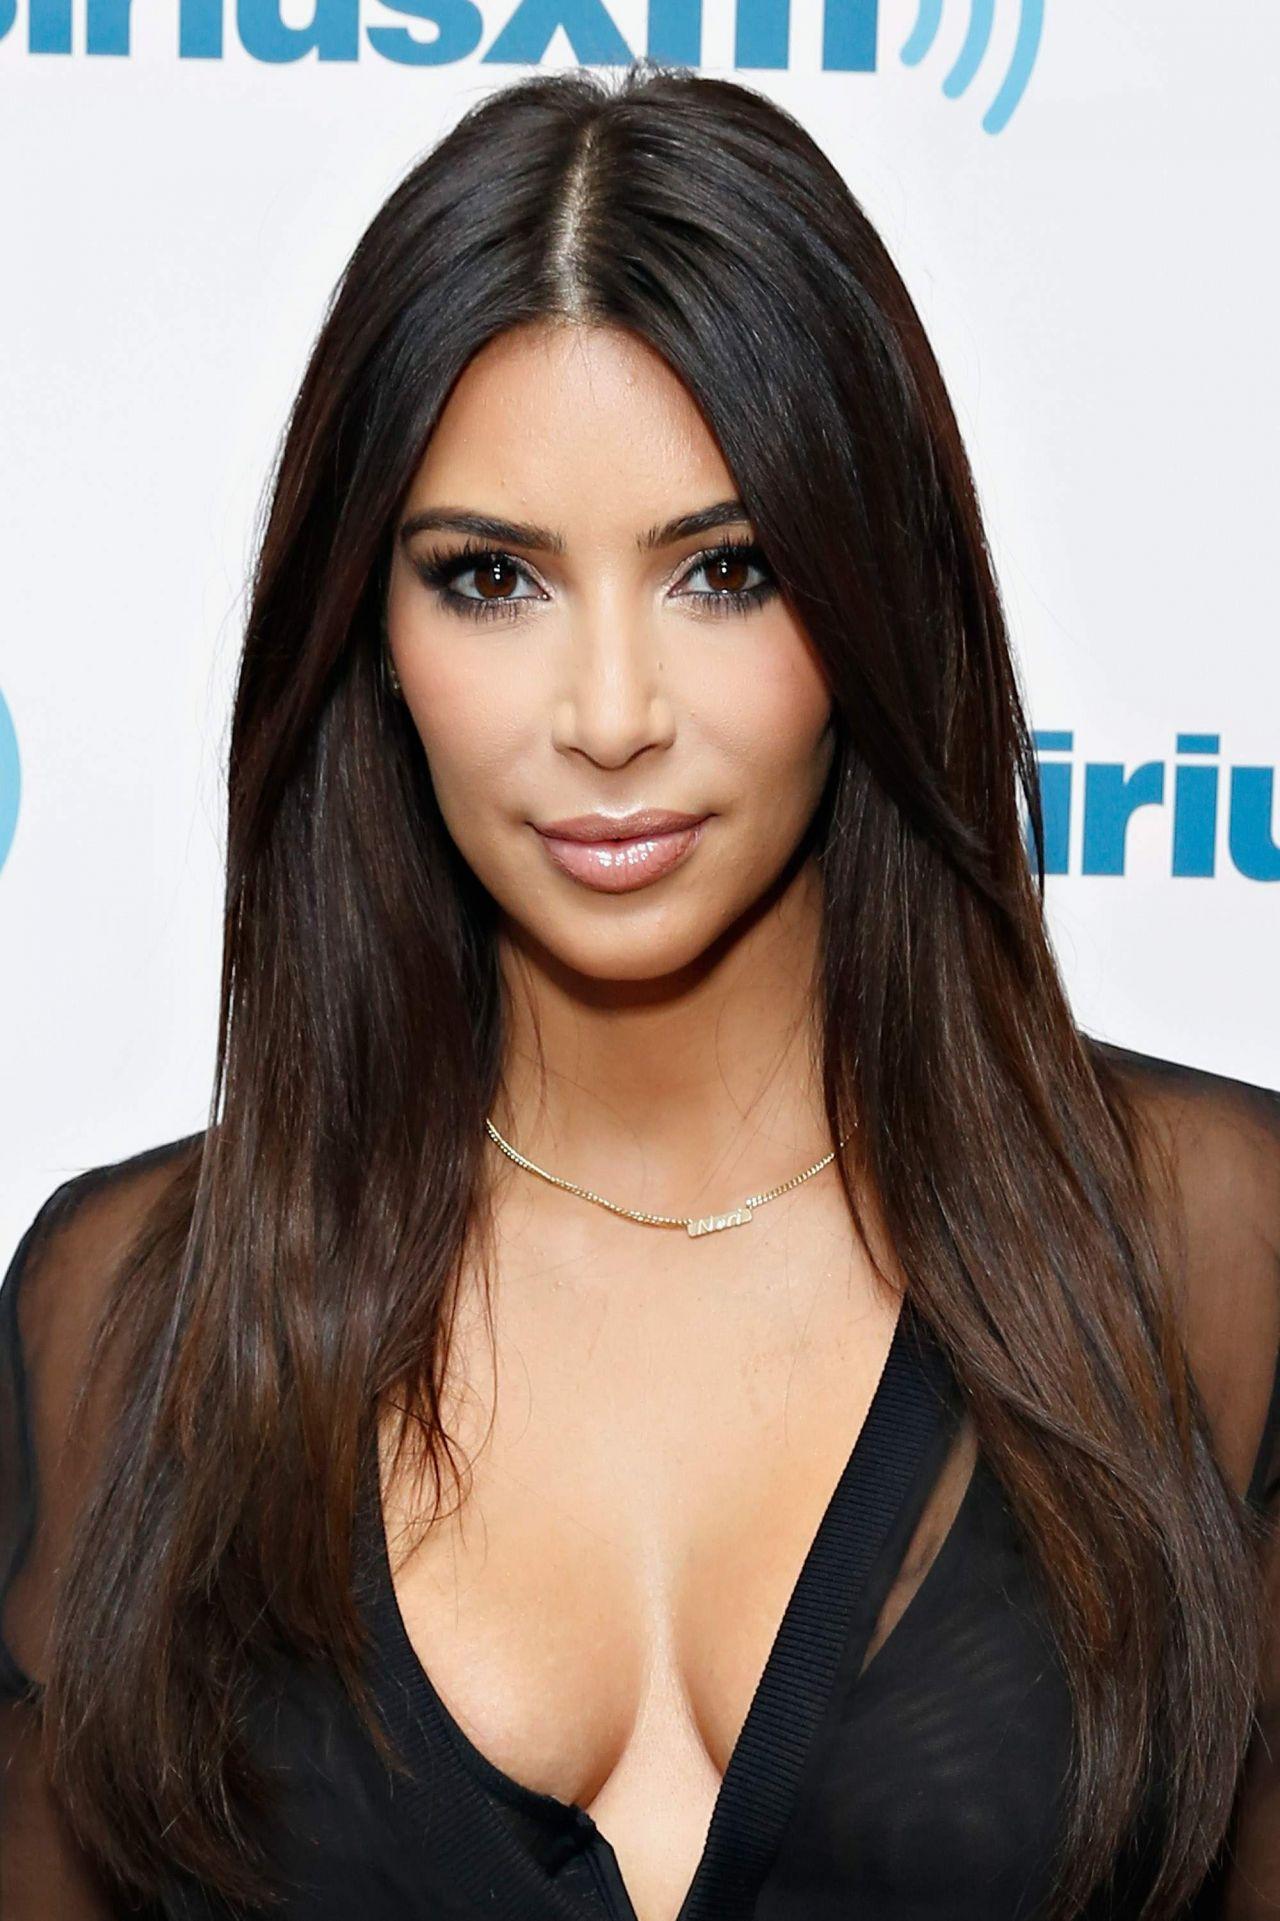 Kim Kardashian Interviews Kylie Jenner About Her Best: Kim Kardashian At The SiriusXM Studios In New York City